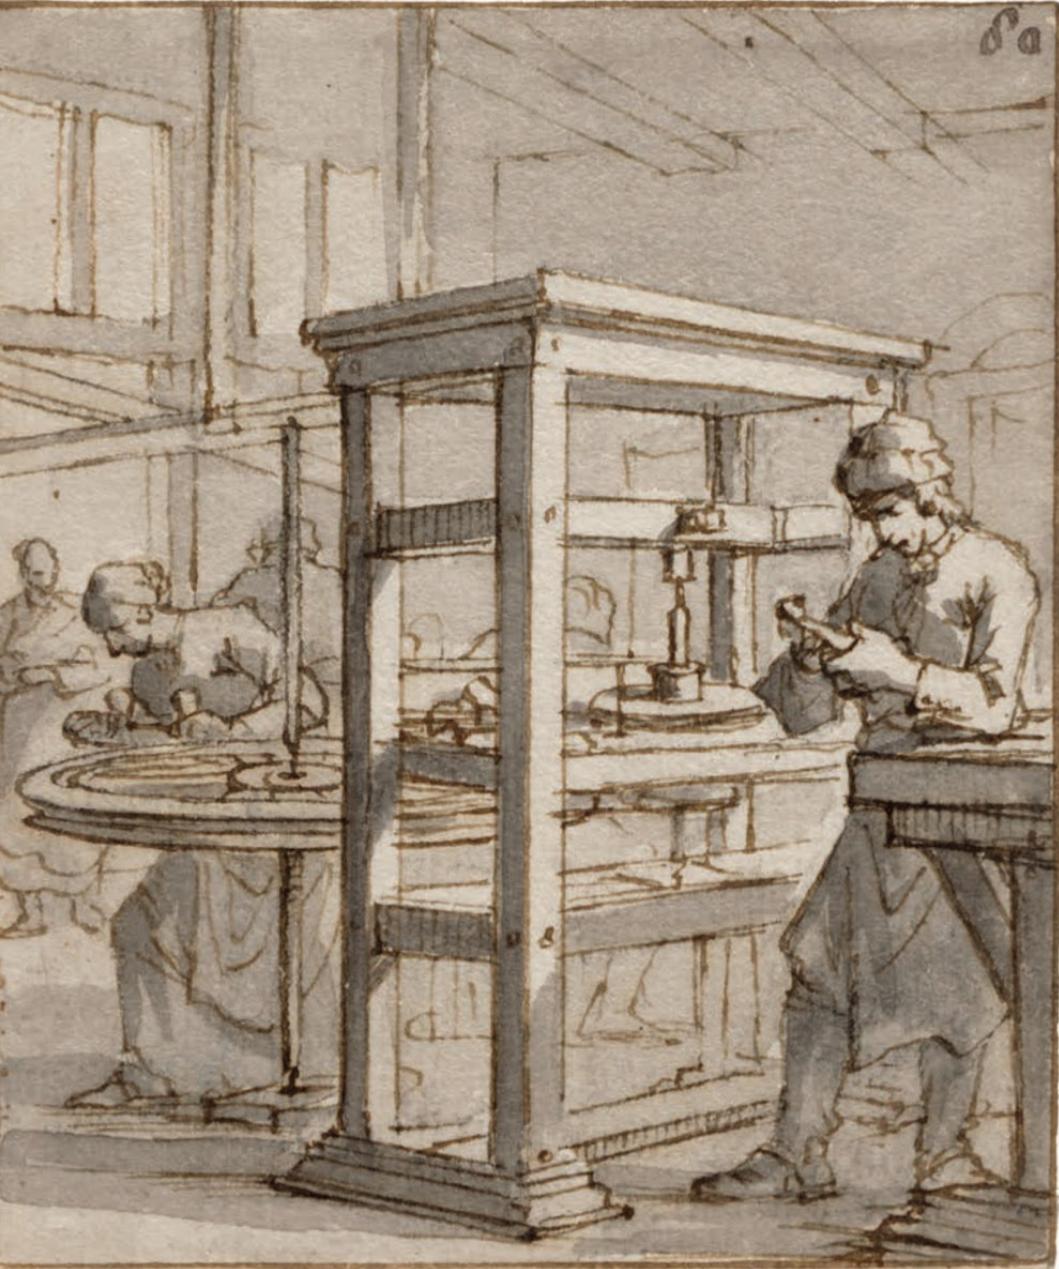 diamond cutting shop in amsterdam 1694